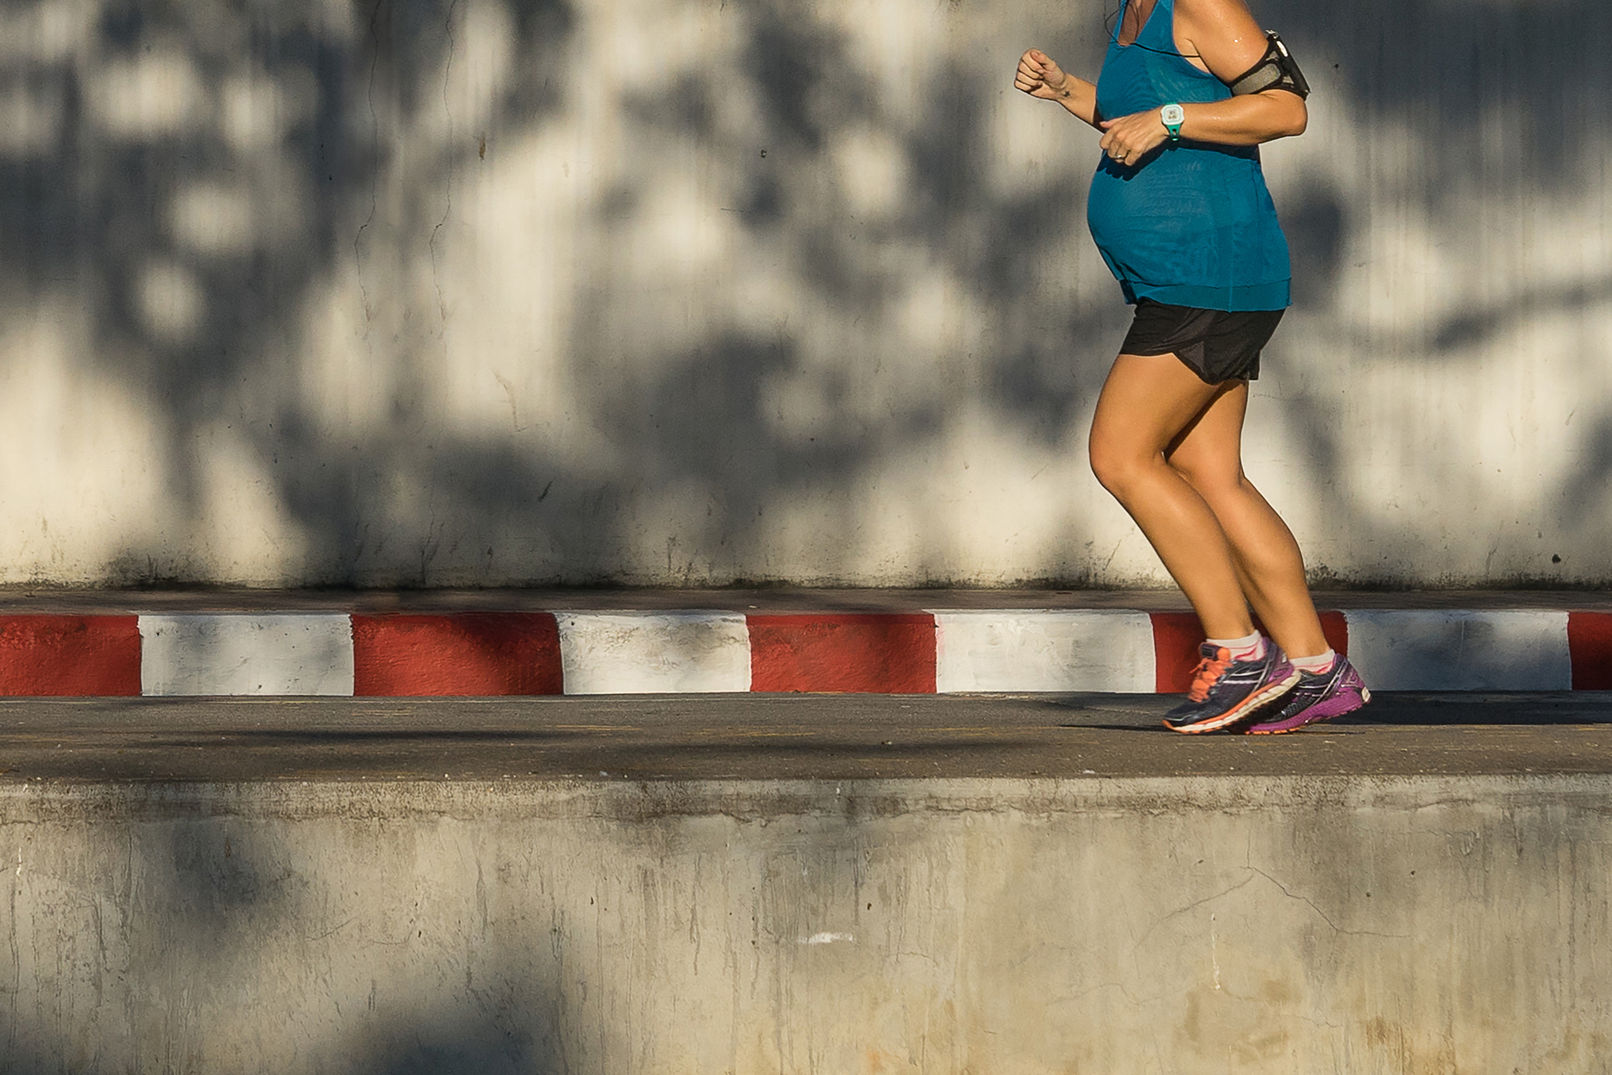 Run, Baby, Run: Federal Court (Correctly) Sends Pregnancy Discrimination Case to Trial